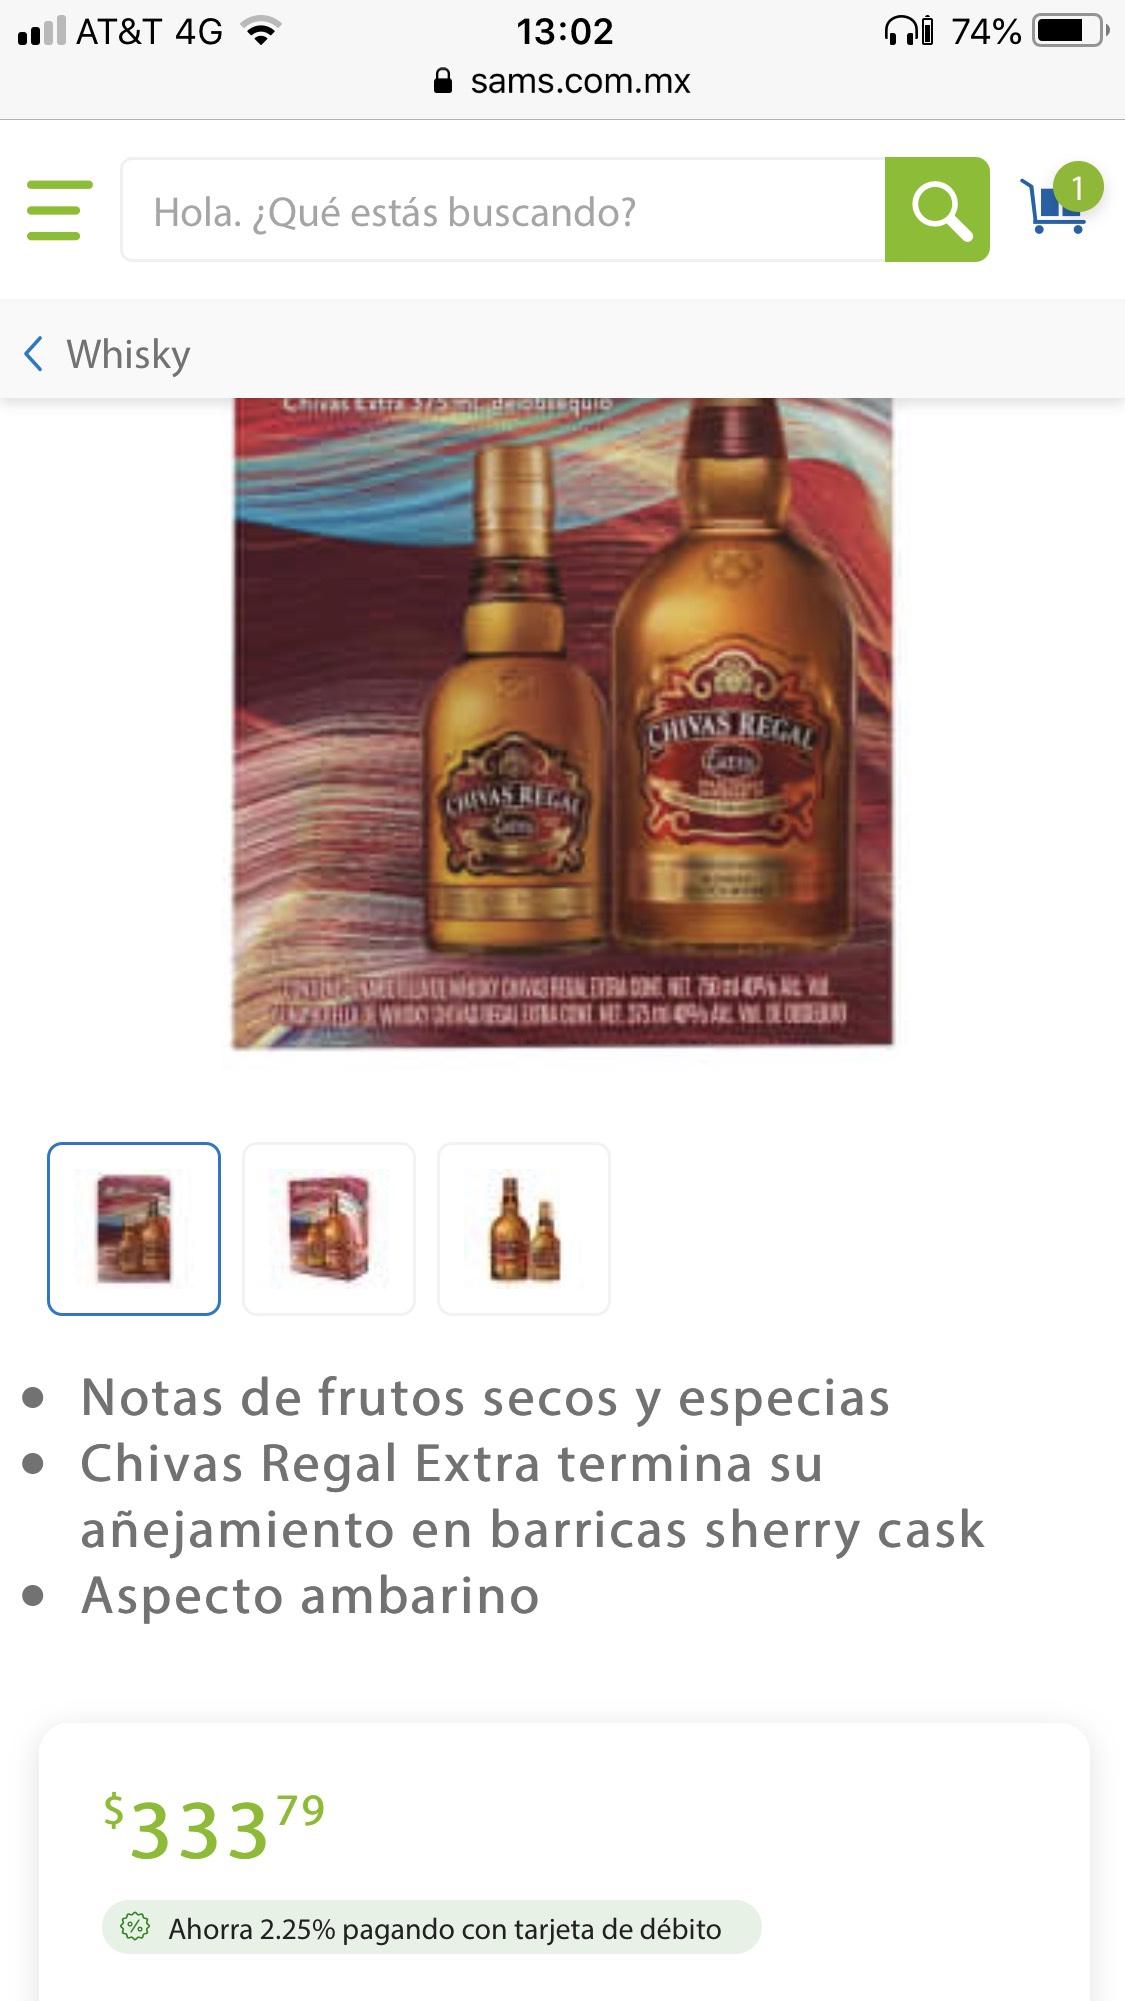 Sam's Club: Chivas Regal Extra 750ml + Chivas Extra 375ml